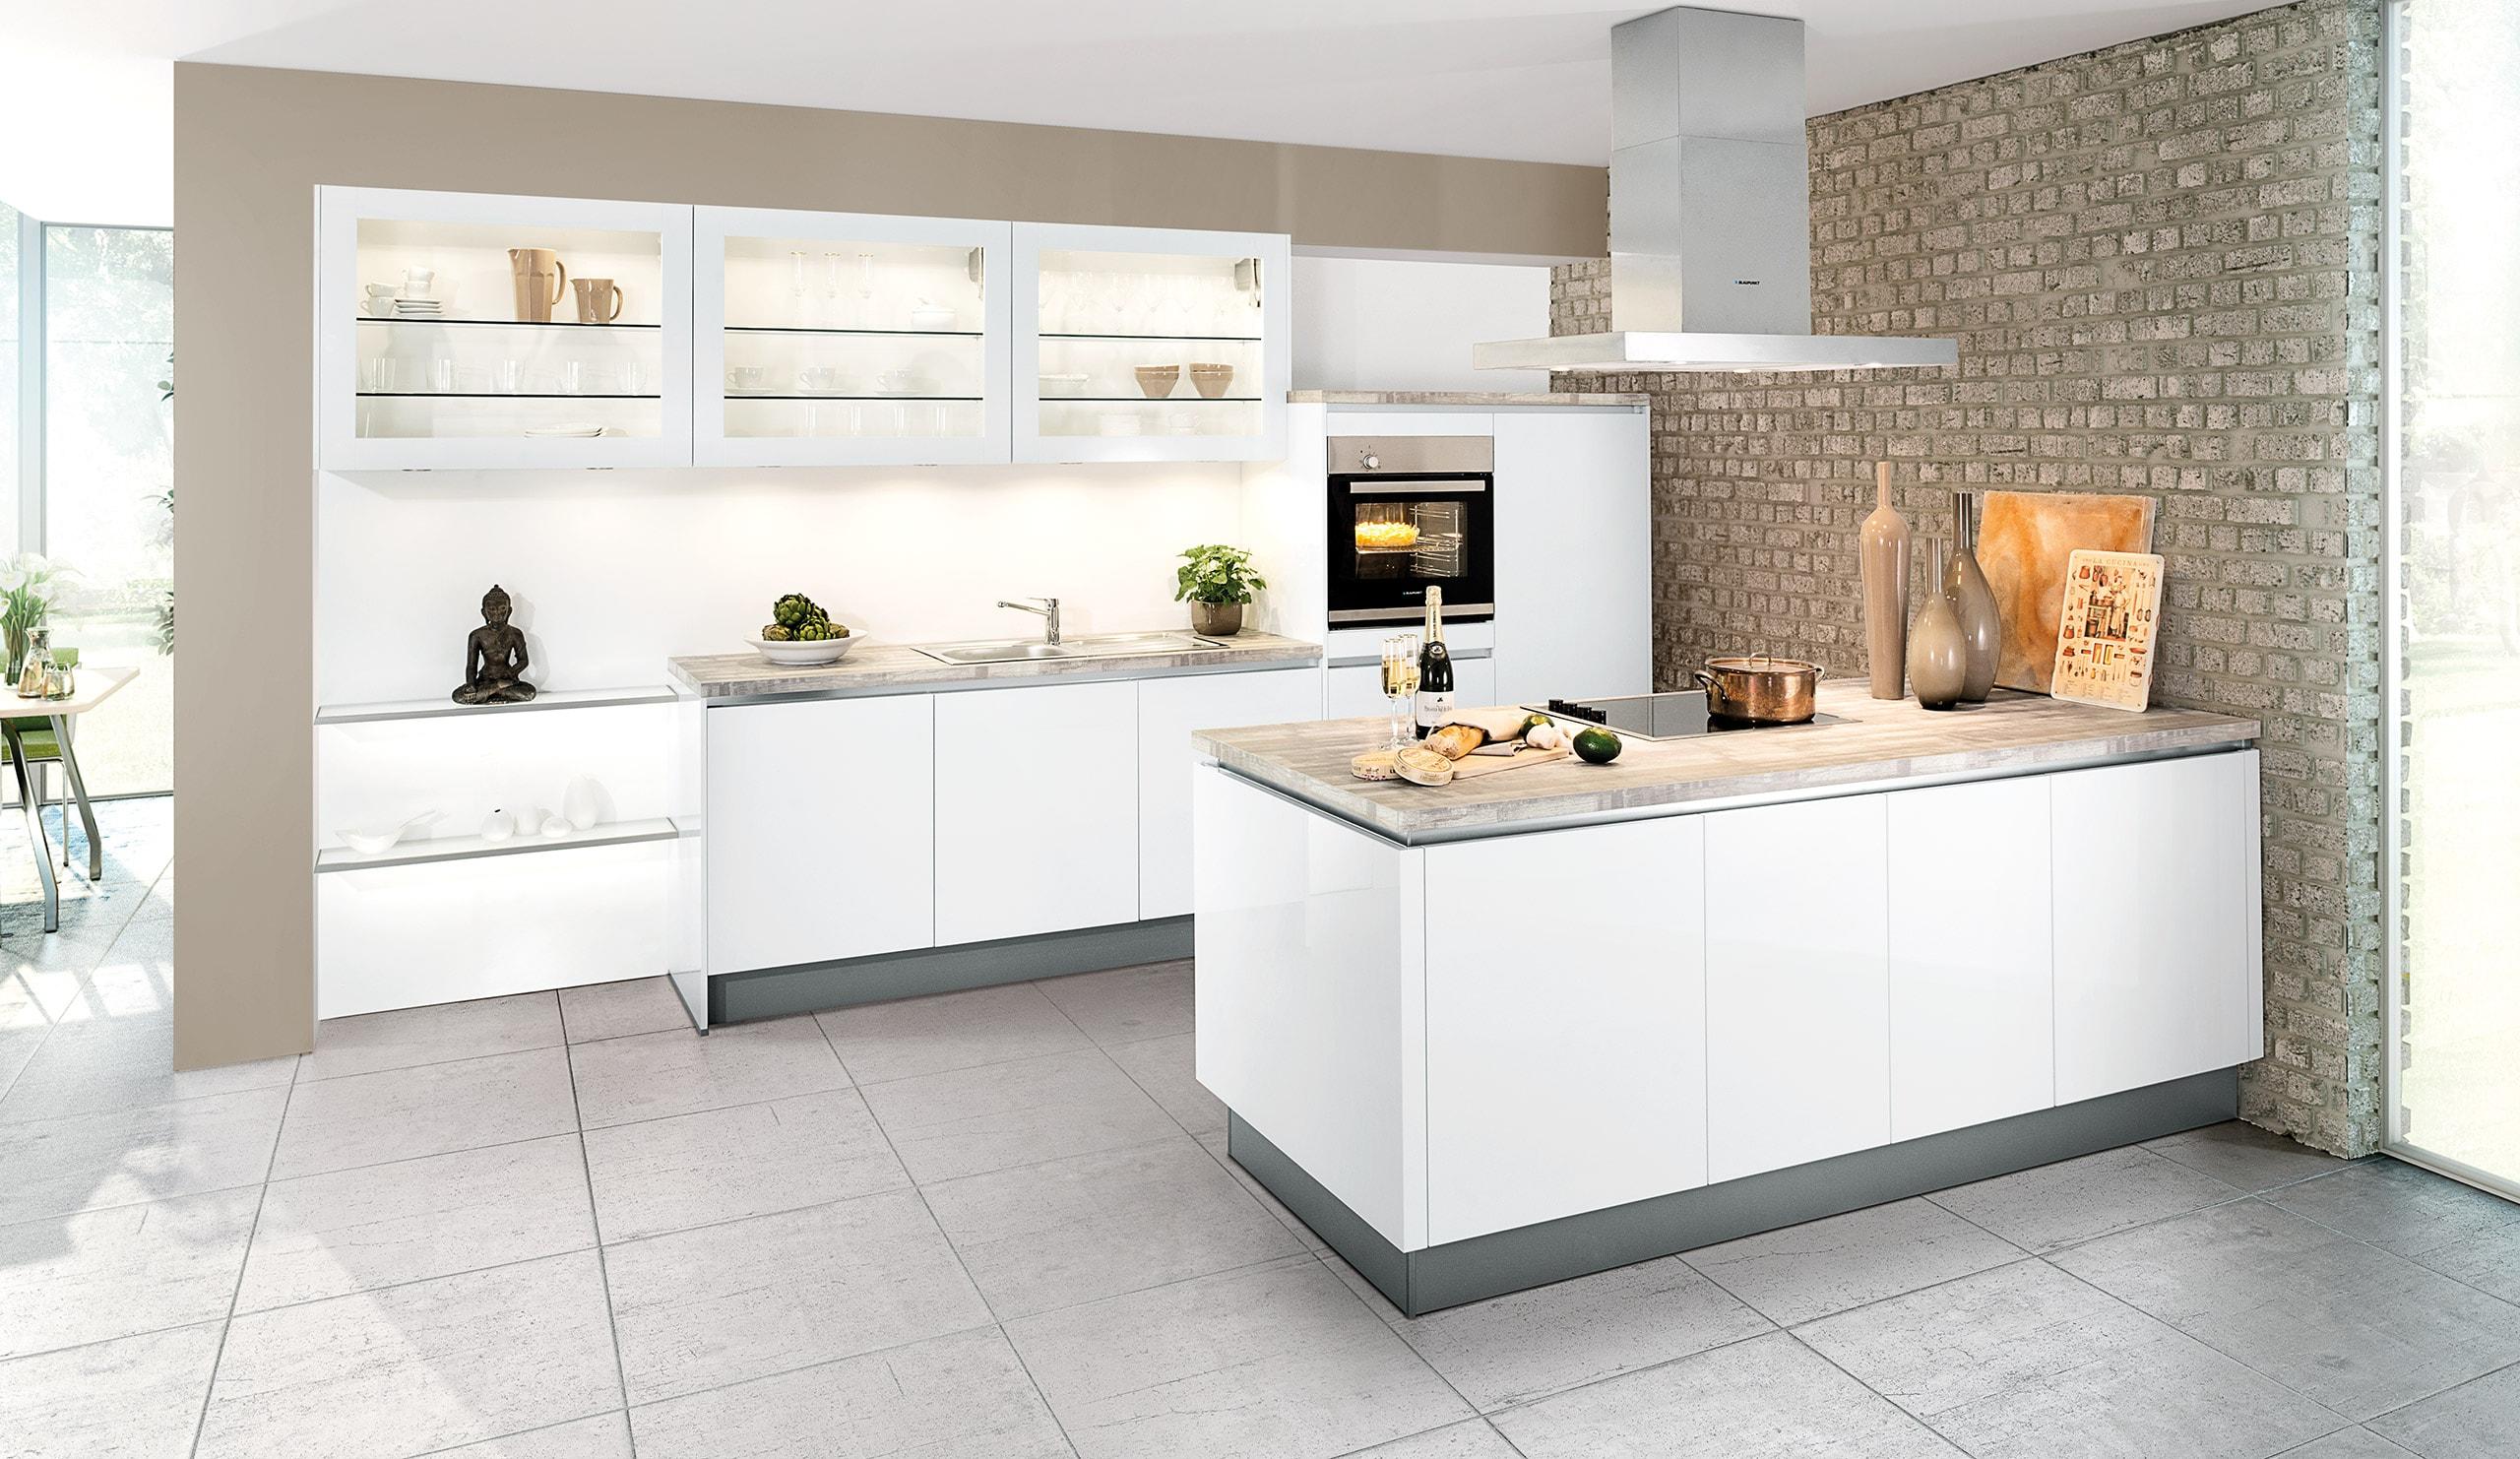 Full Size of Ikea Küche Faktum Blende Ikea Küche Blende Montieren Küche Sockelblende Ecke Küche Sockelblende Kaufen Küche Küche Blende